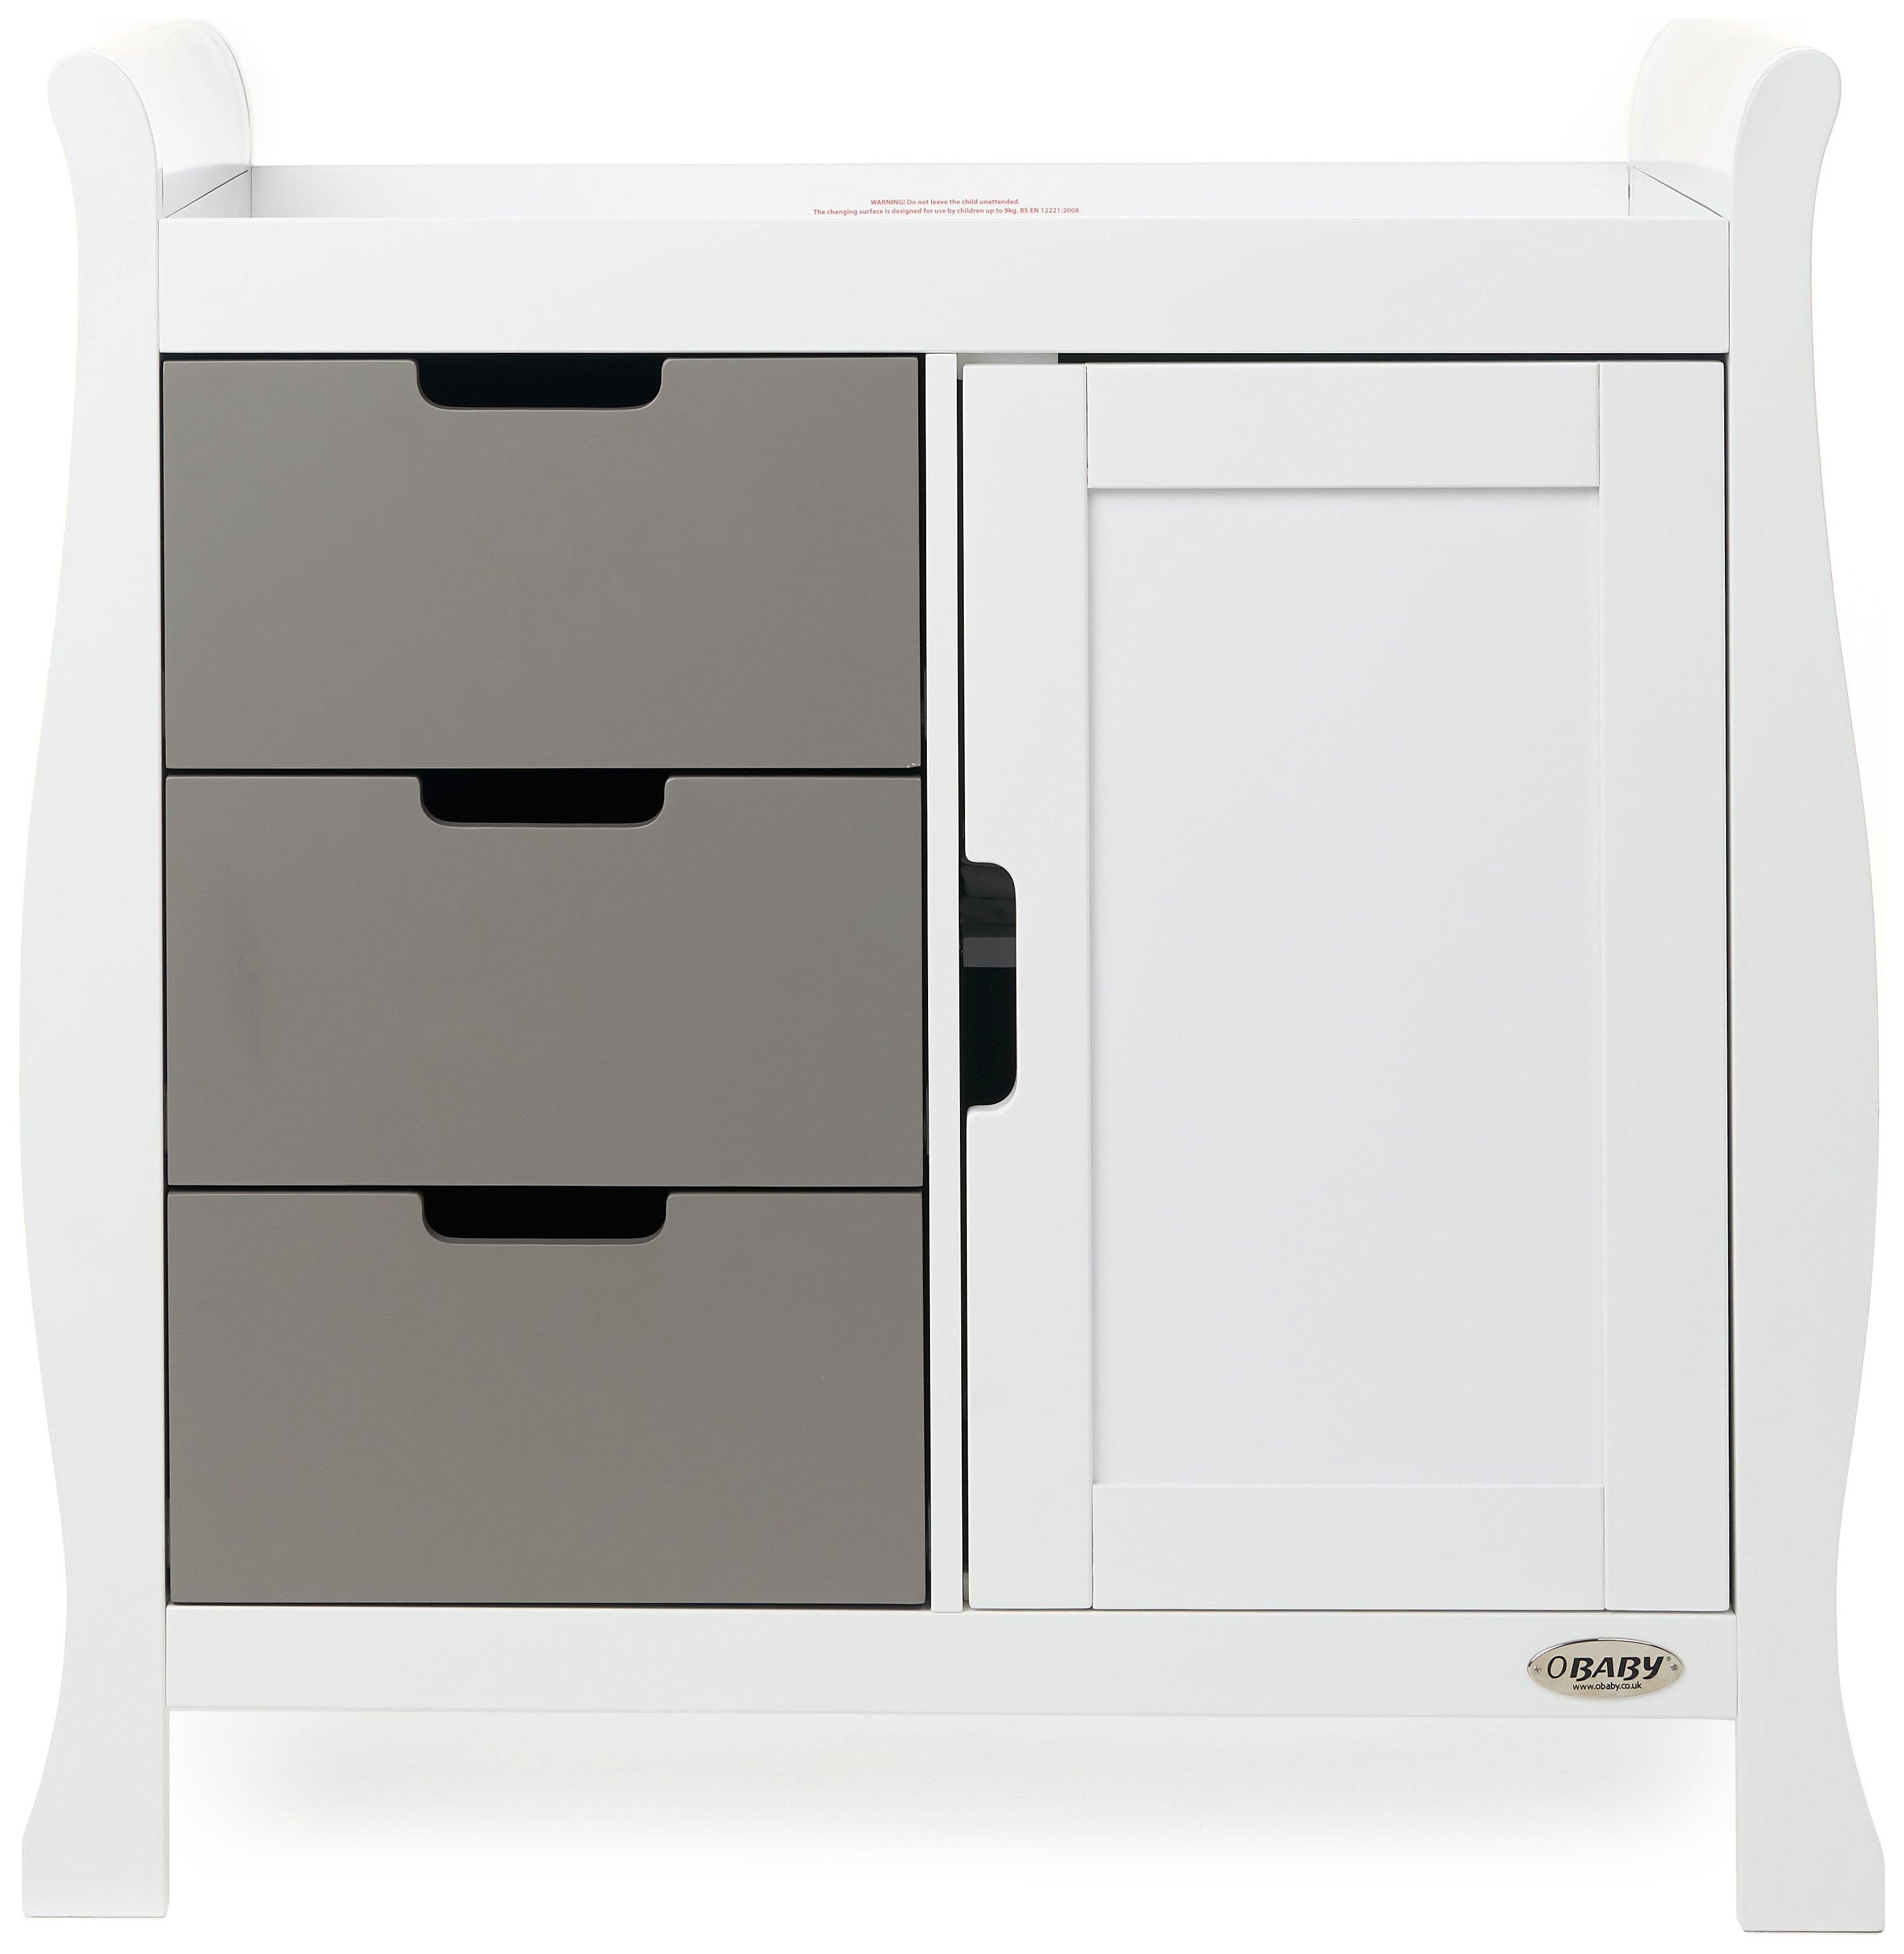 Obaby Stamford Sleigh Changing Unit - White & Taupe Grey